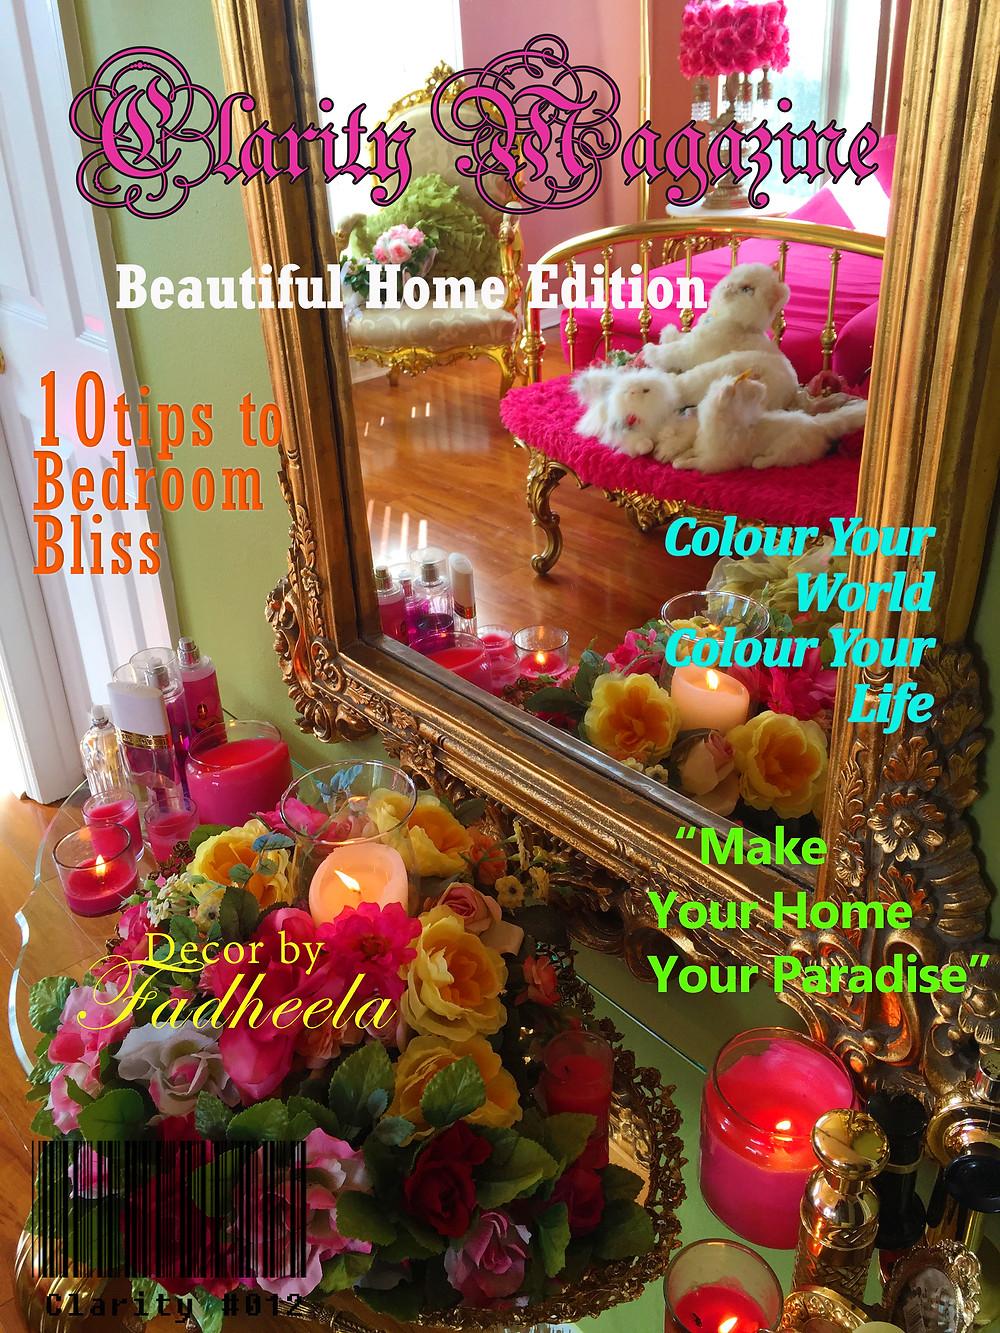 Clarity Magazine